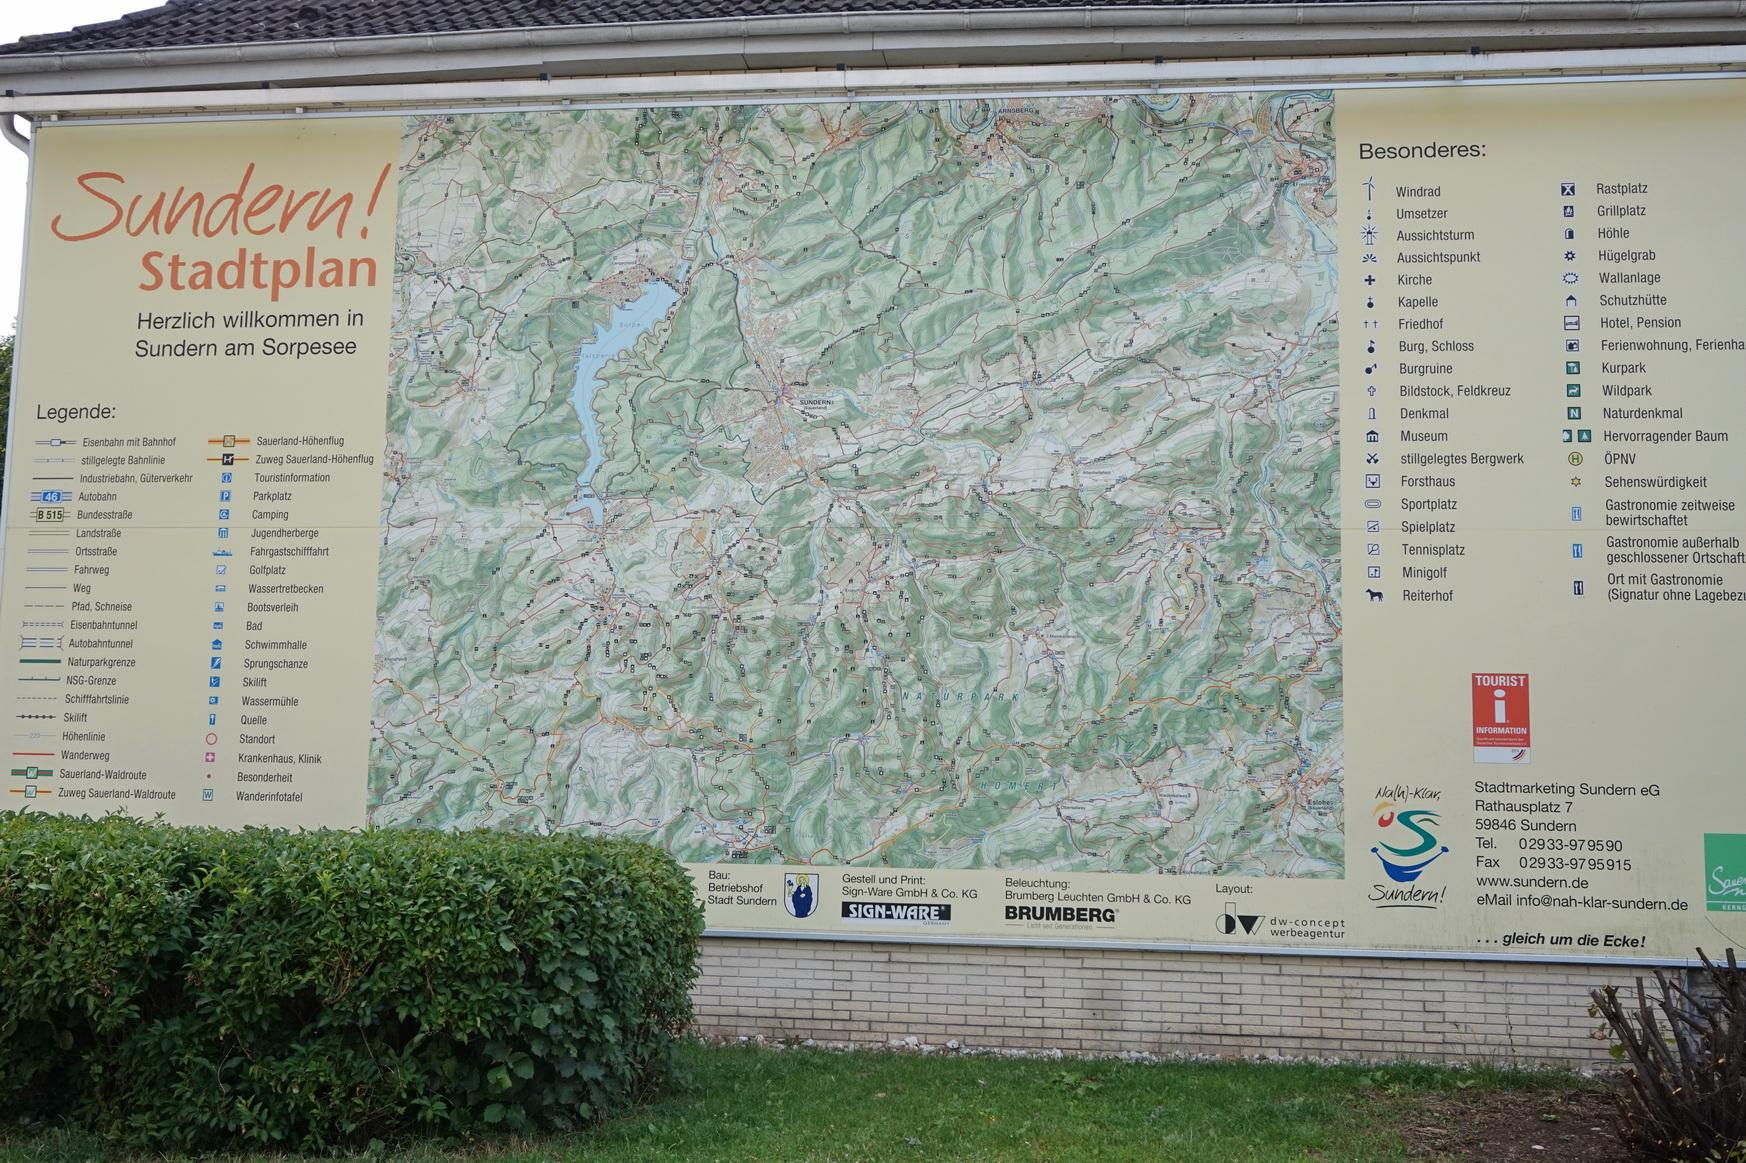 Wanderkarte in Sundern im Sauerland